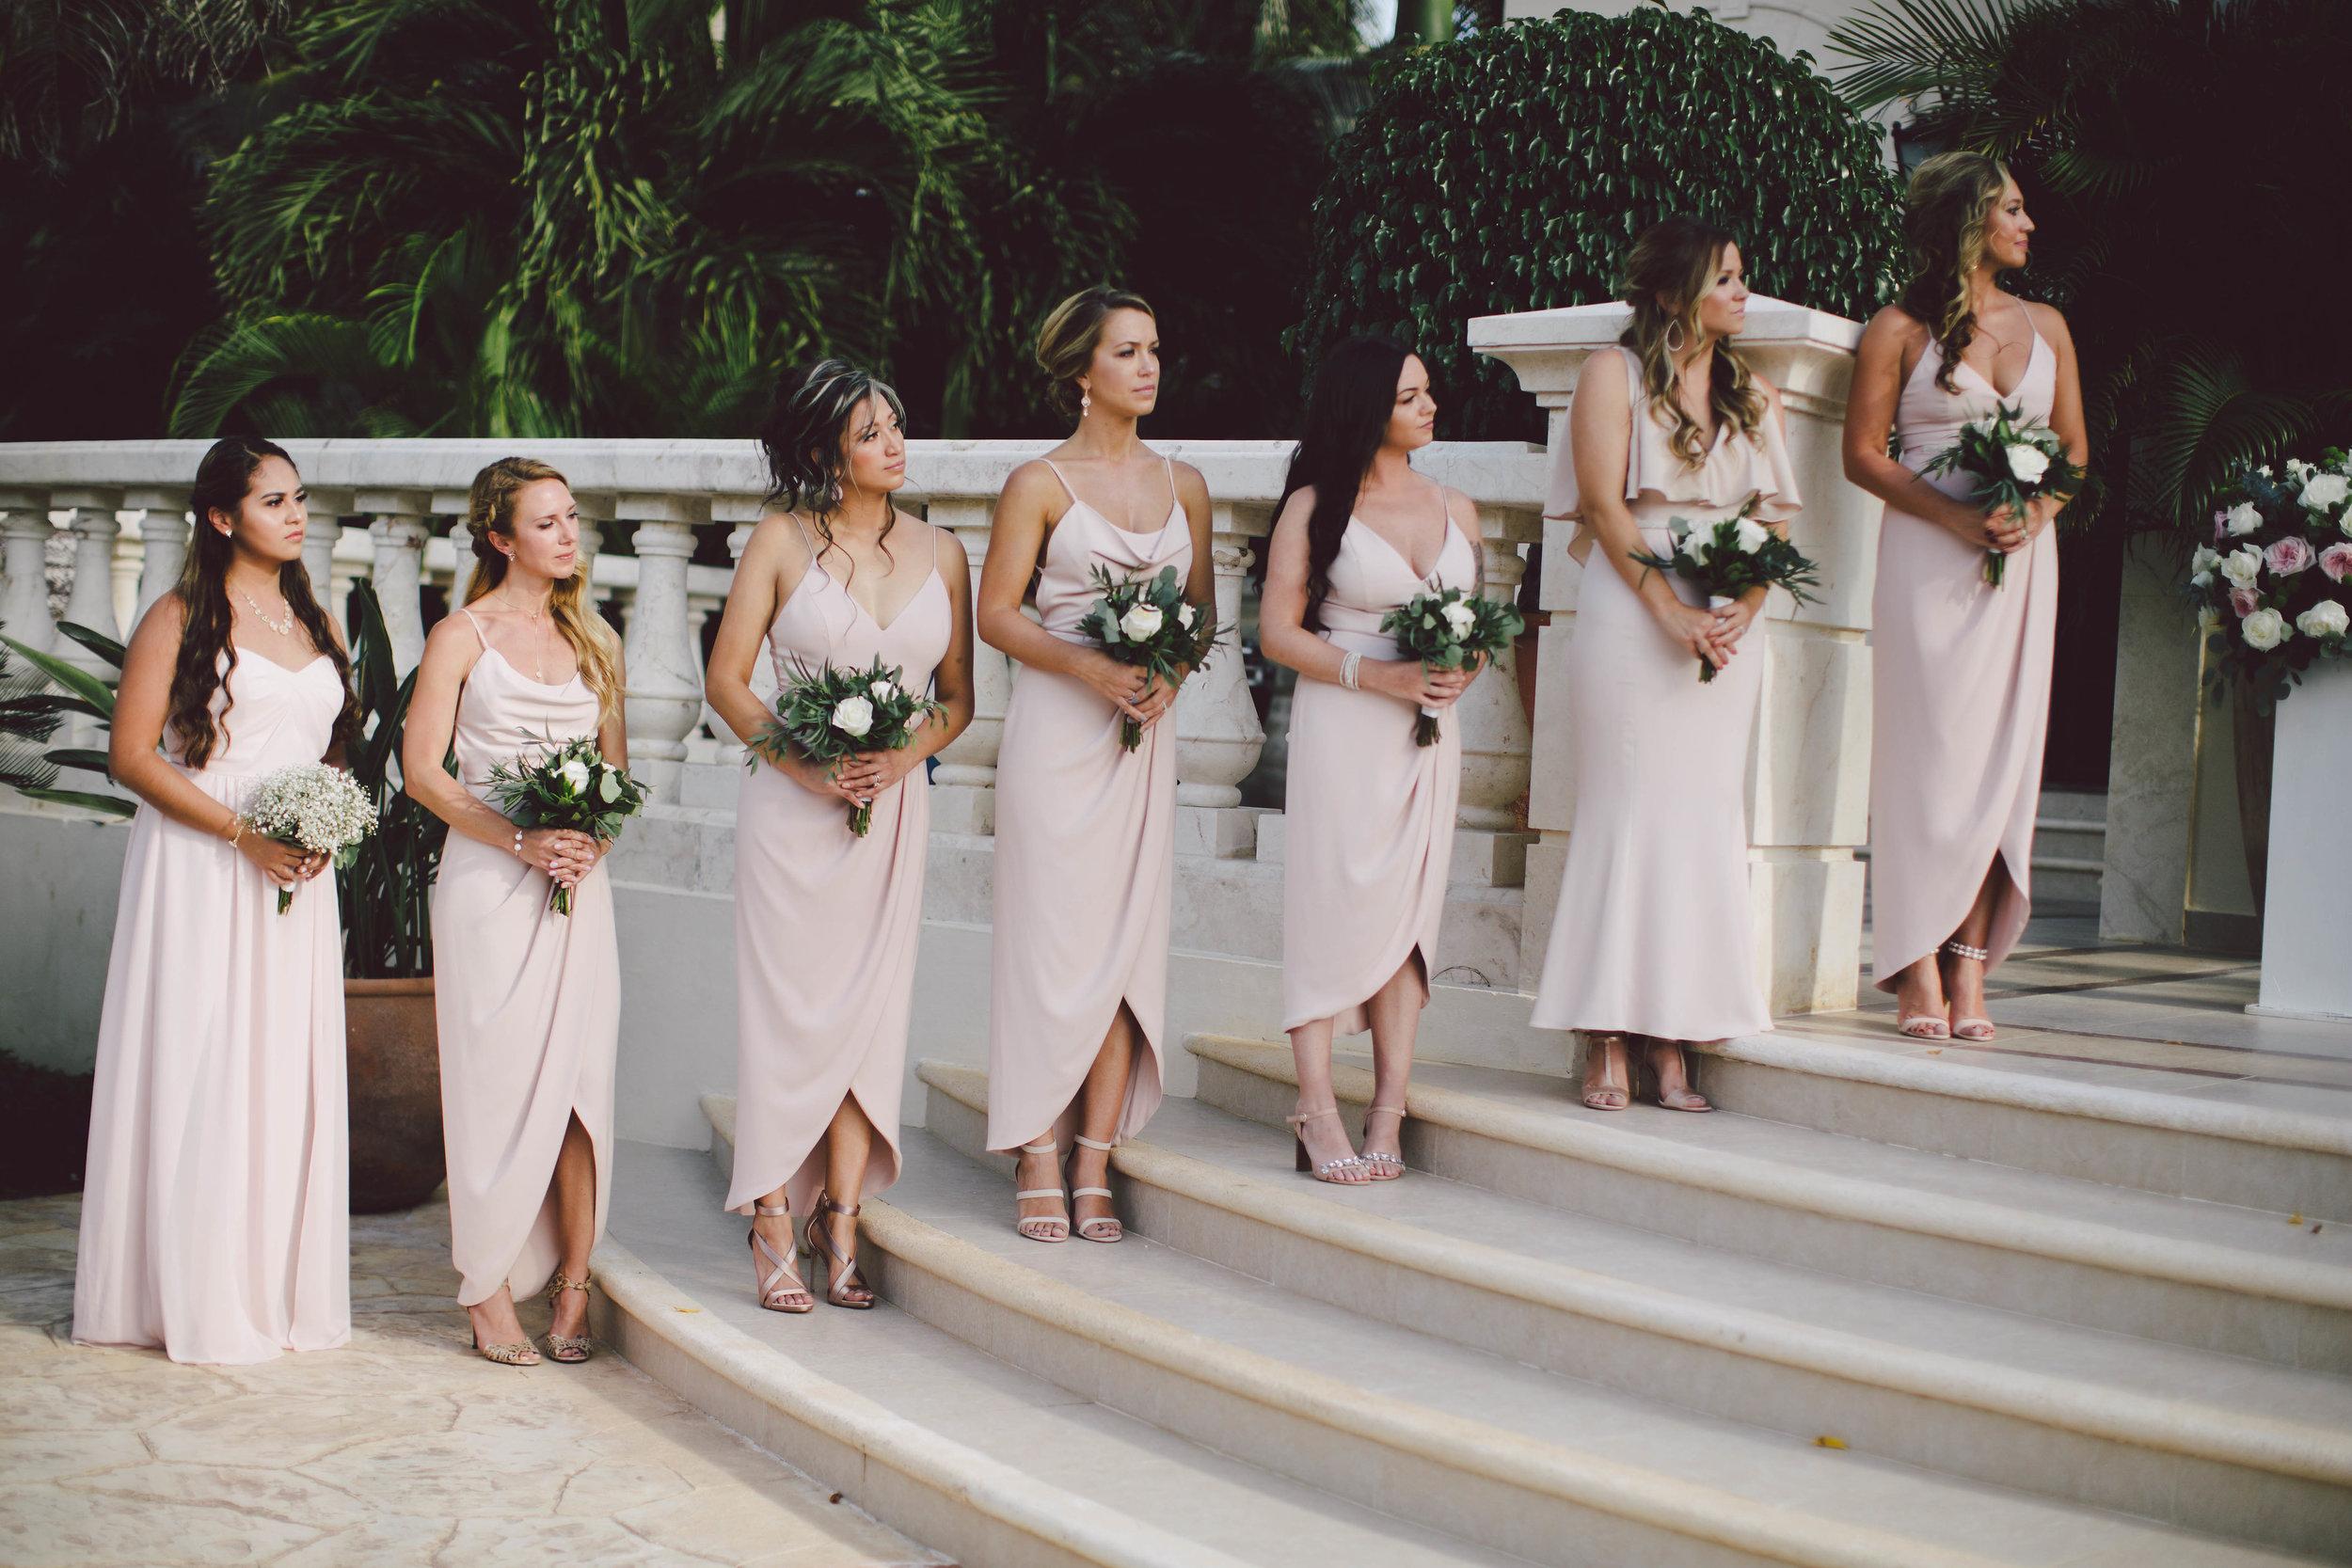 mexico_wedding_cancun_villa_la_joya_evangeline_lane_050.jpg